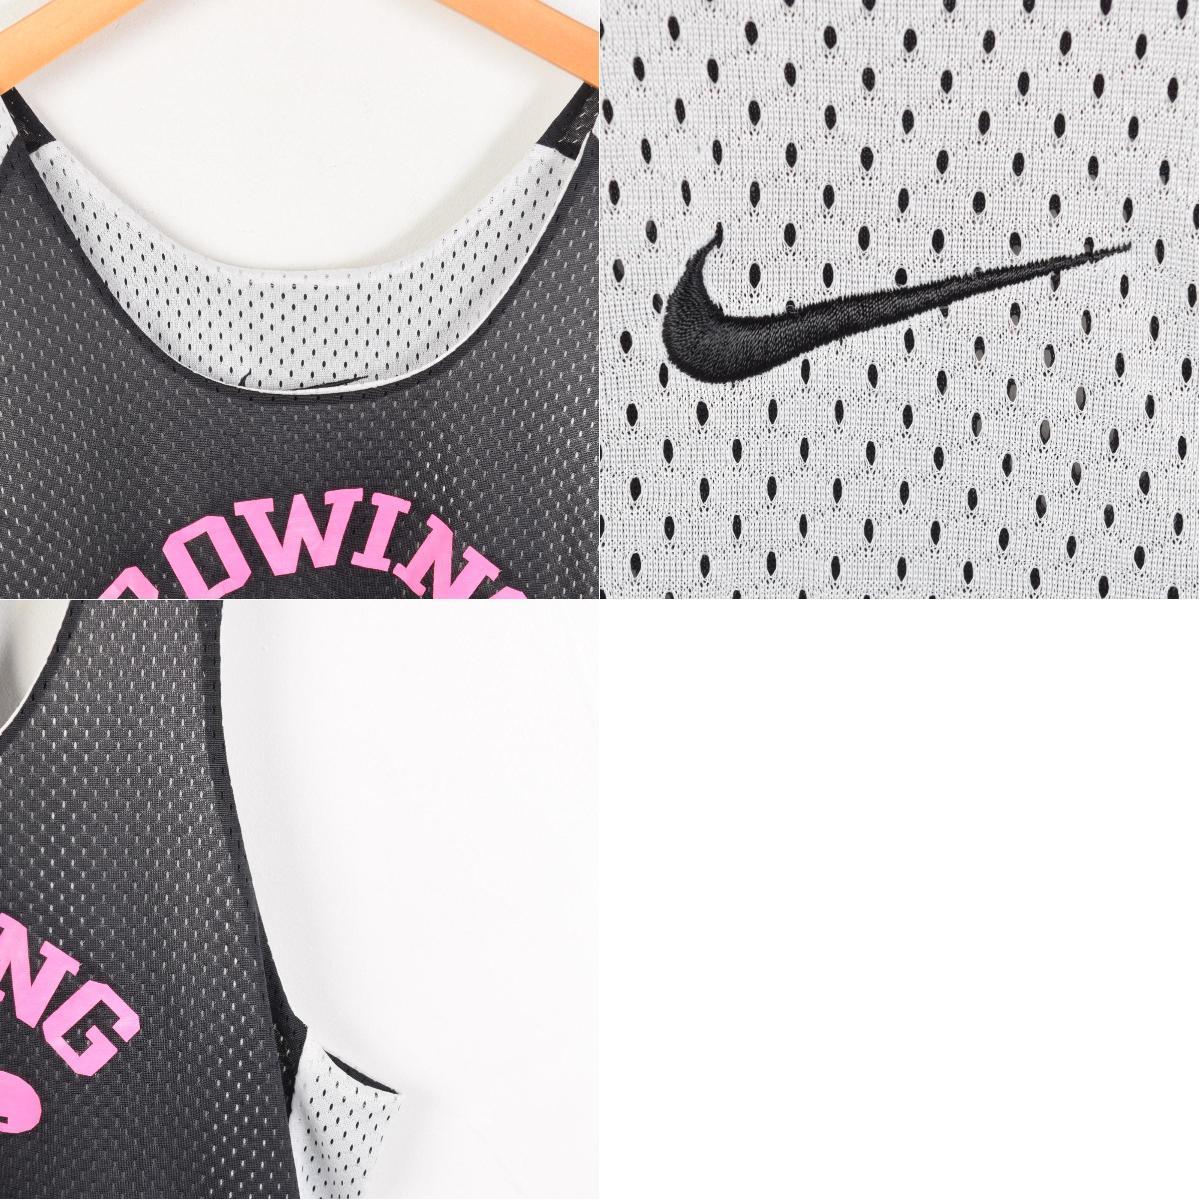 41a9d6d5efe53 VINTAGE CLOTHING JAM  Nike NIKE TEAM reversible mesh tank top men S ...